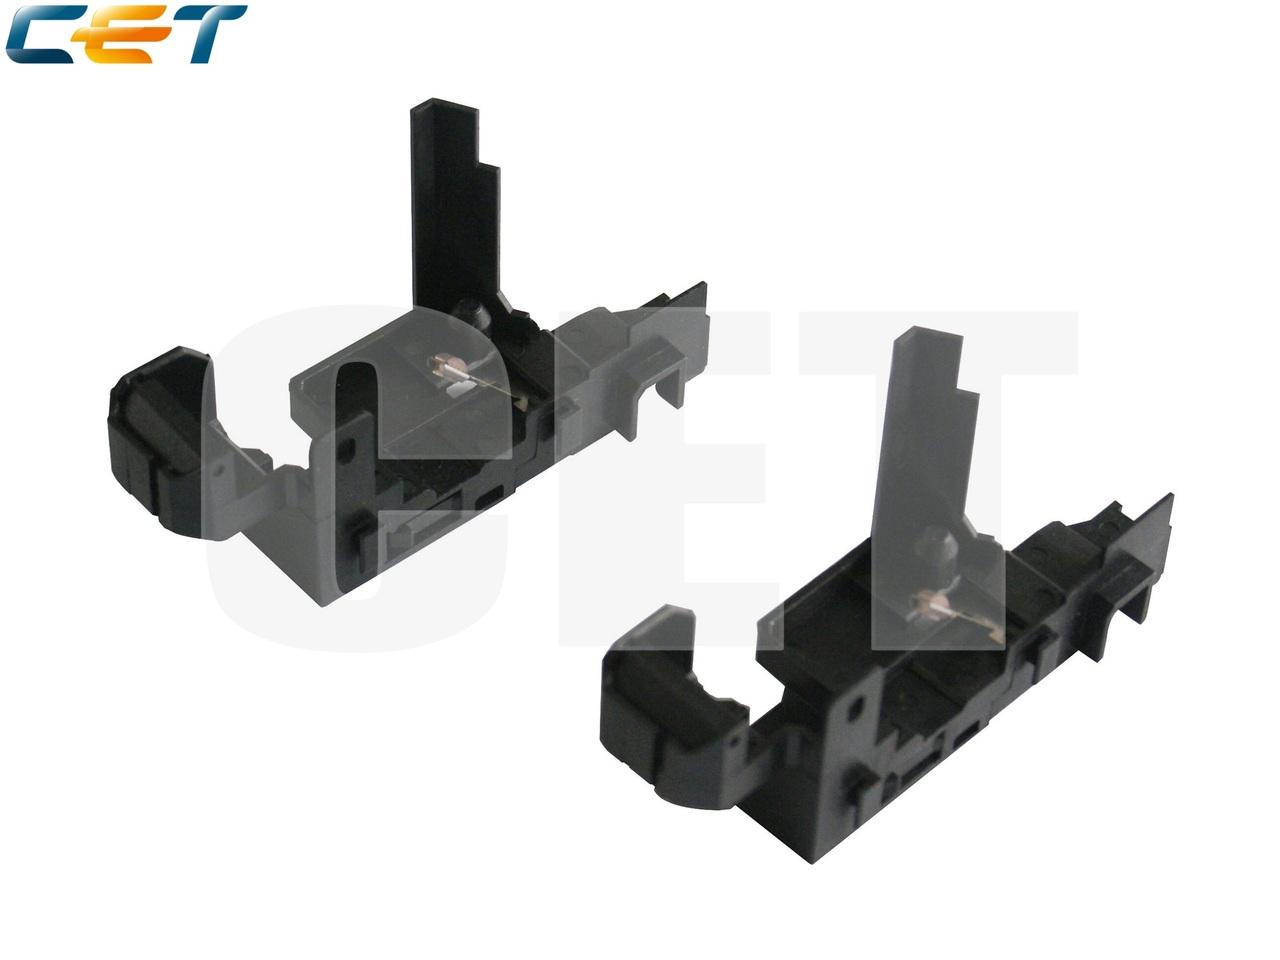 Левая крышка фьюзера для LaserJet P4014/P4015/P4515,M601/M602/M603/M604/M605/M606 (CET), CET5809